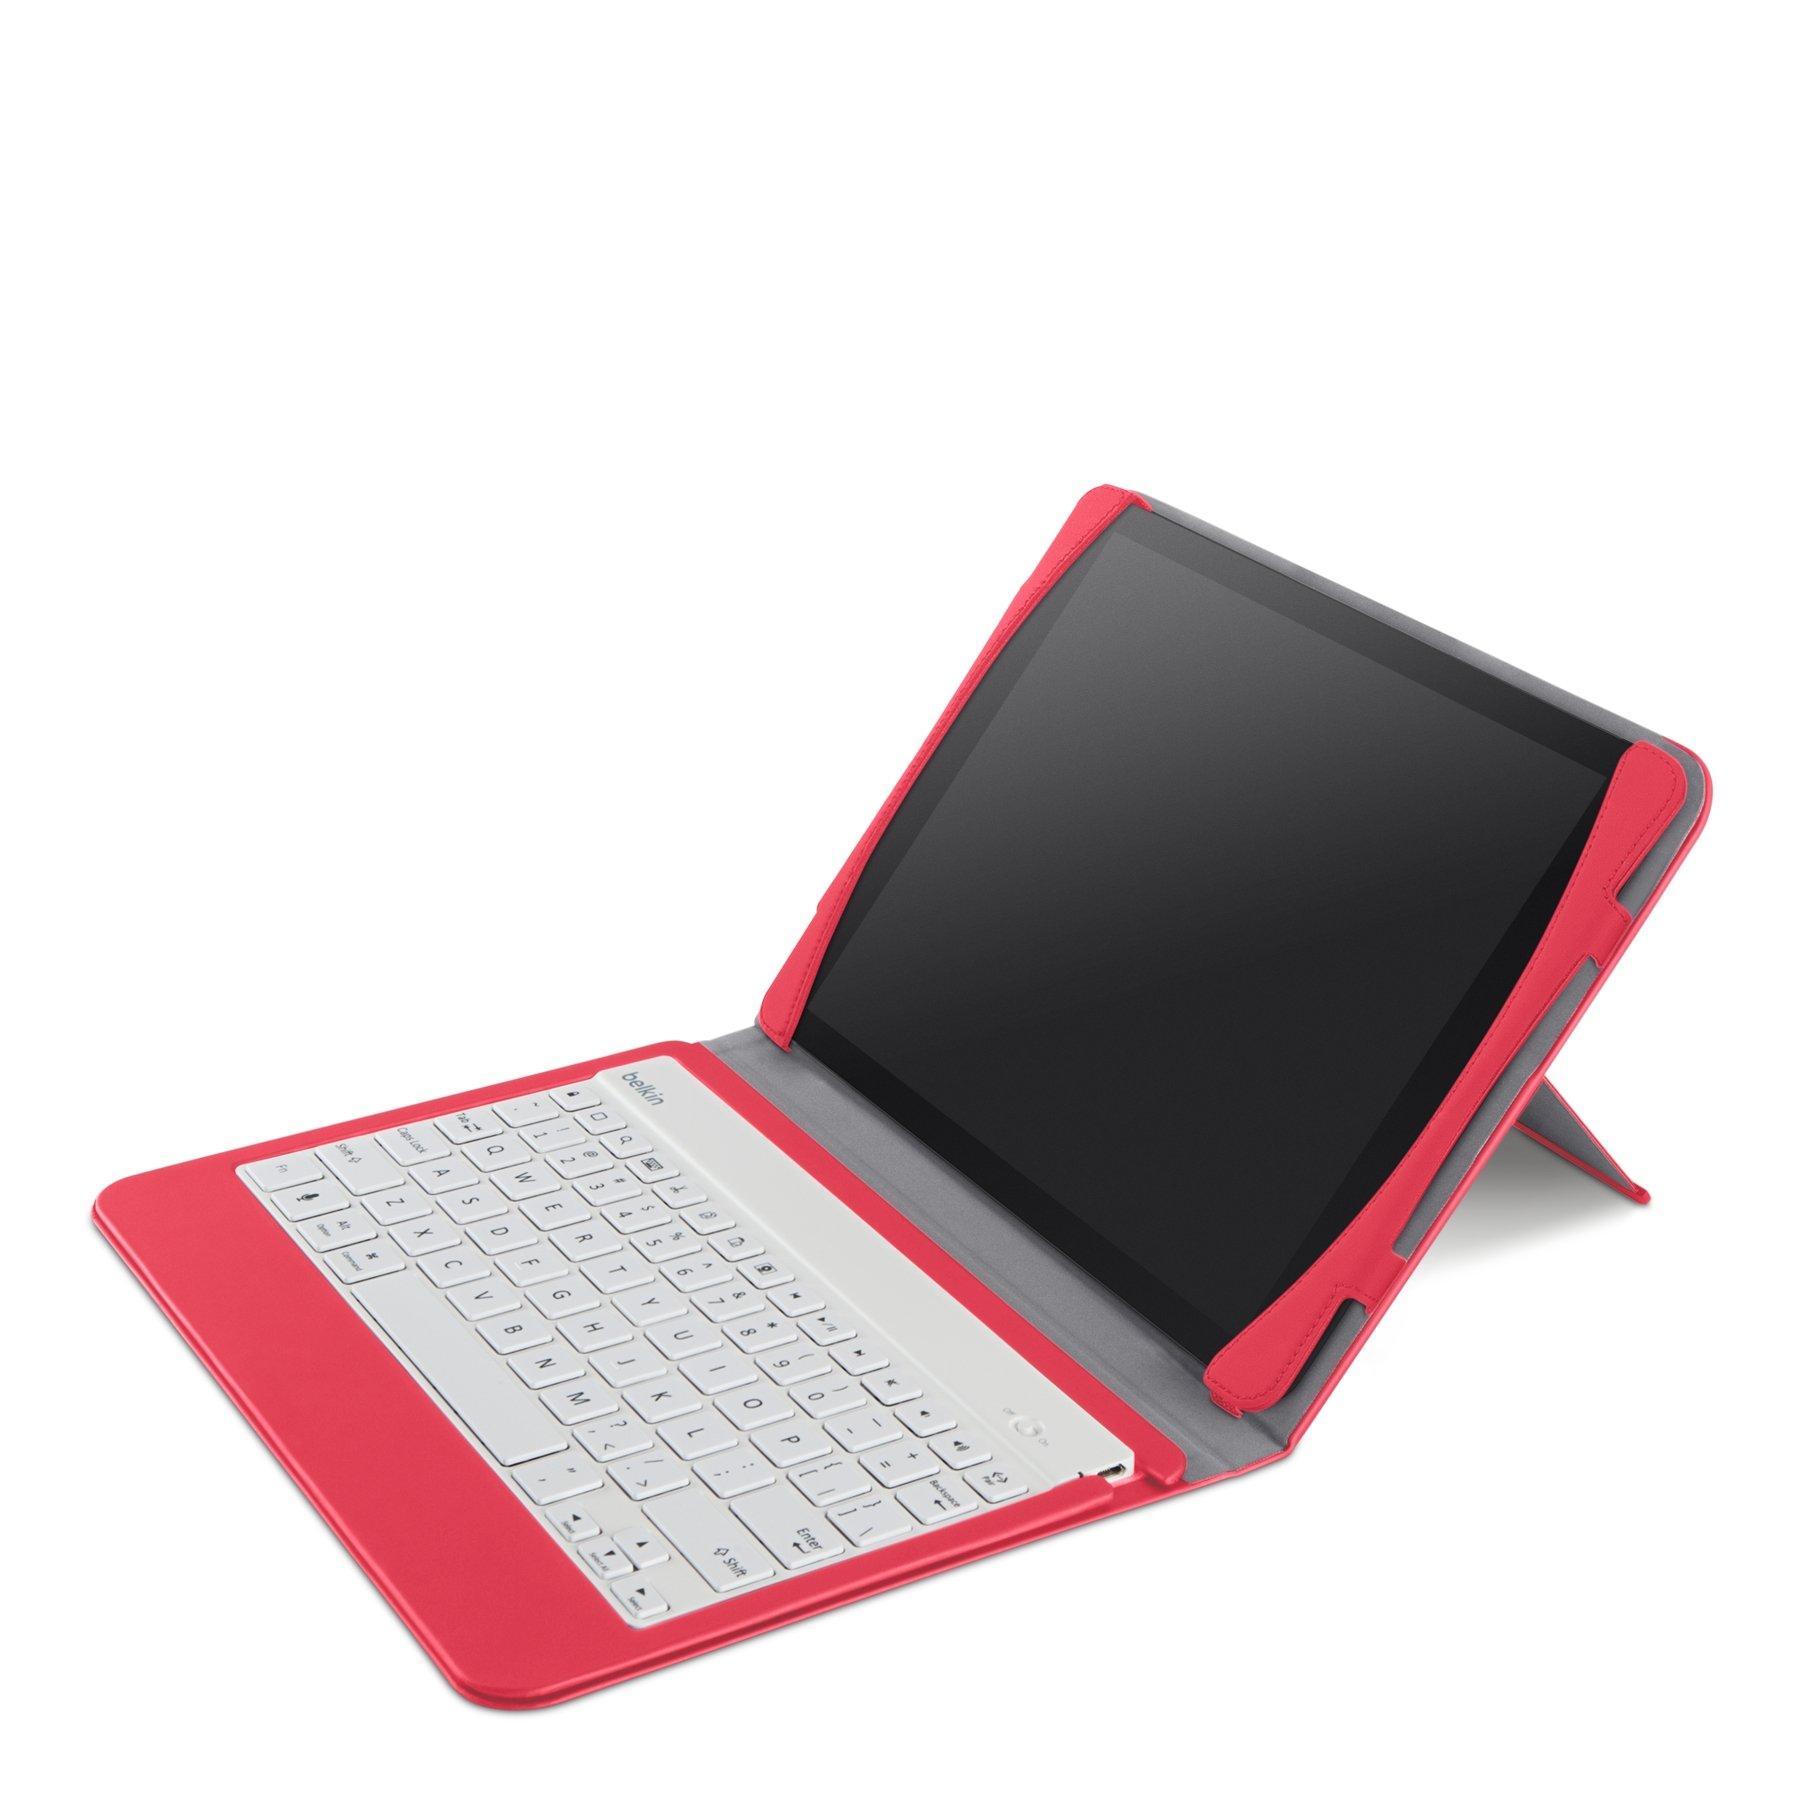 Belkin QODE Slim Style Keyboard Case for iPad Air - Sorbet (F5L152ttC04)